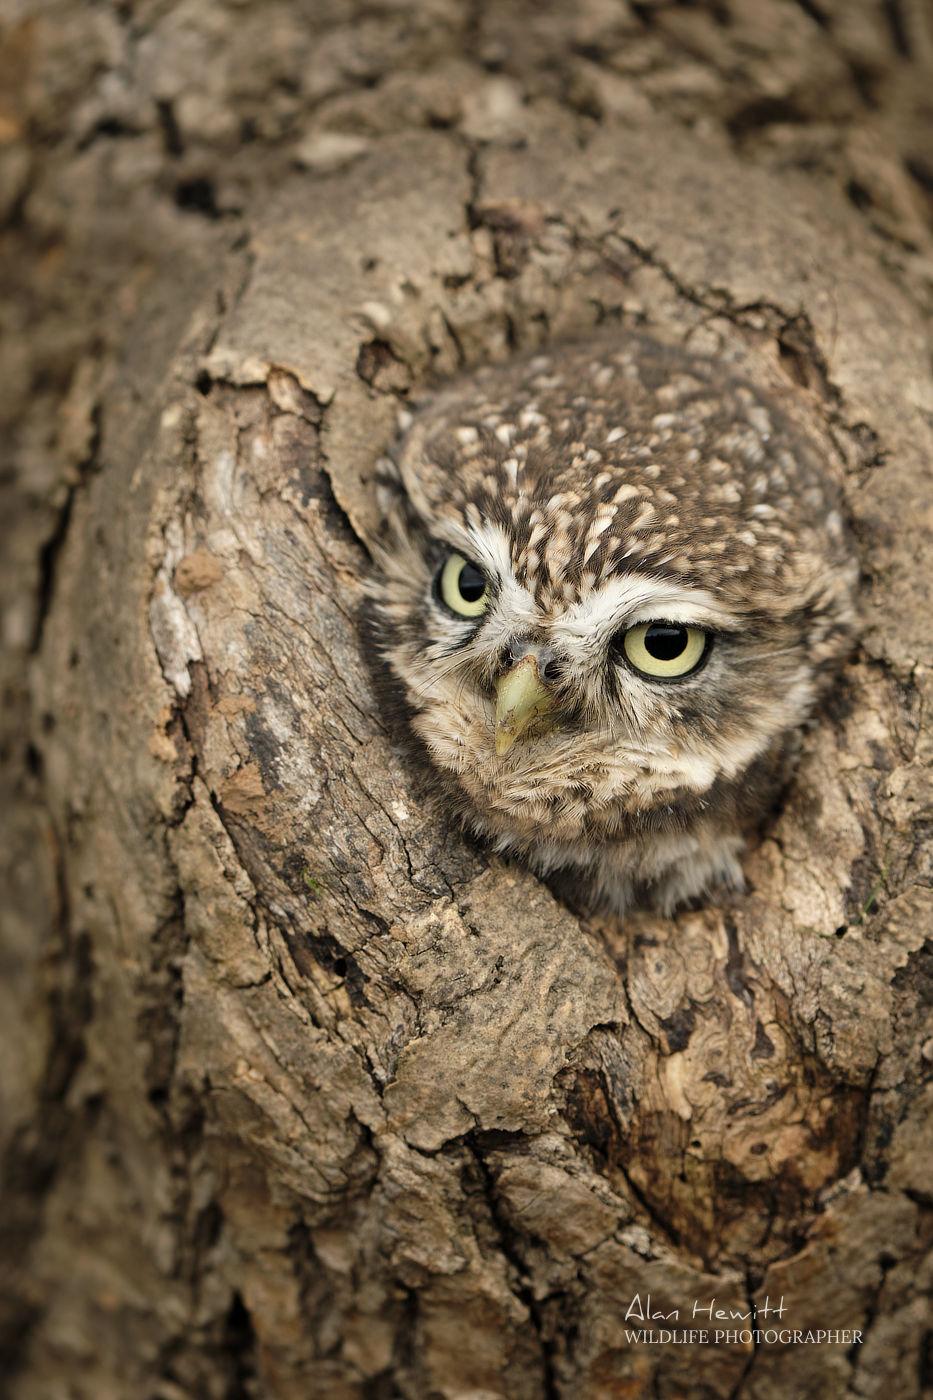 Little Owl Northumberland Birds of Prey Photography Workshop Alan Hewitt